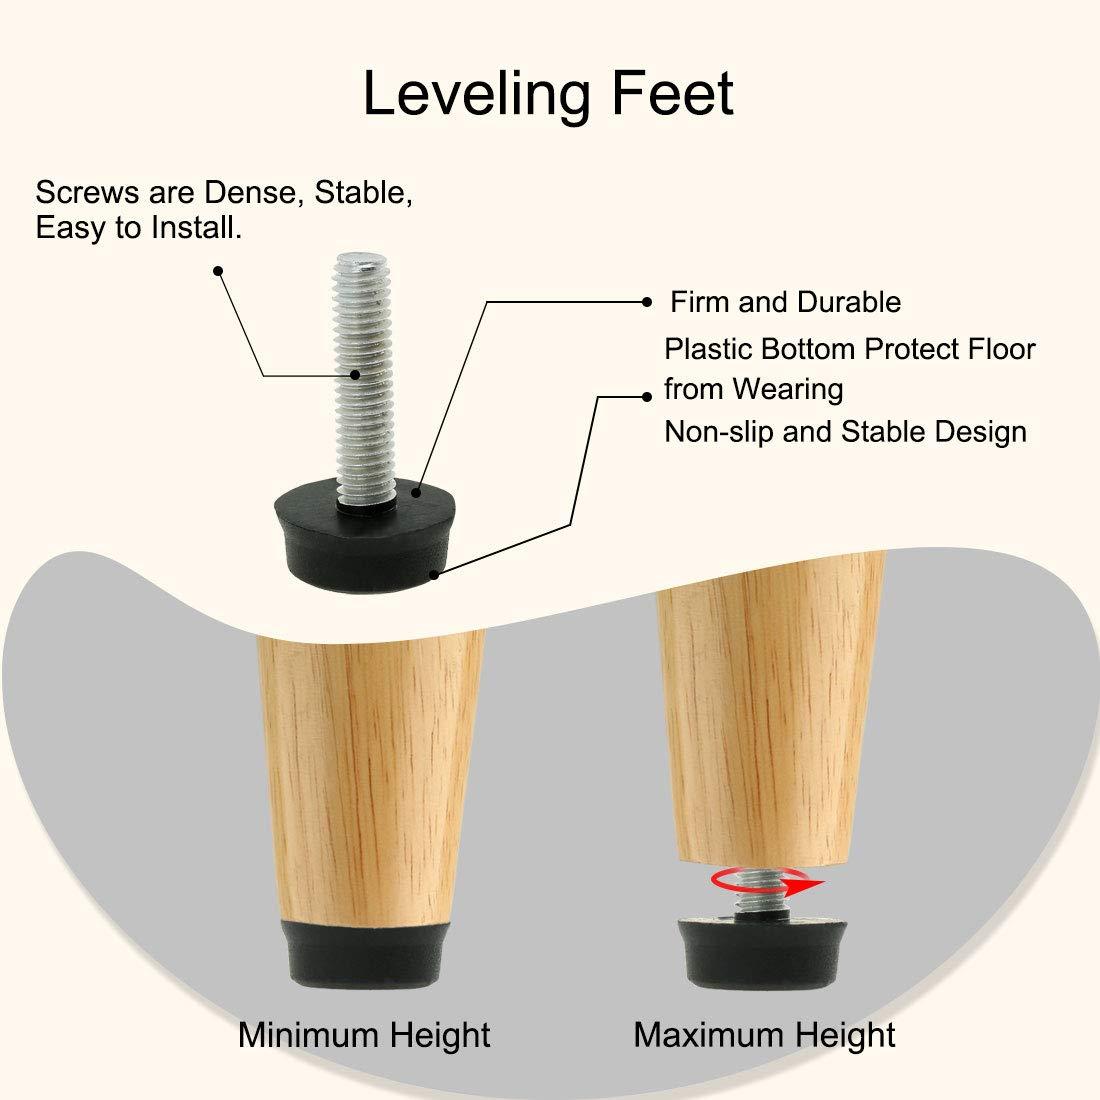 uxcell M6 x 24 x 18mm Furniture Glide Leveling Feet Adjustable Leveler Floor Protector for Table Desk Leg 10 Pack